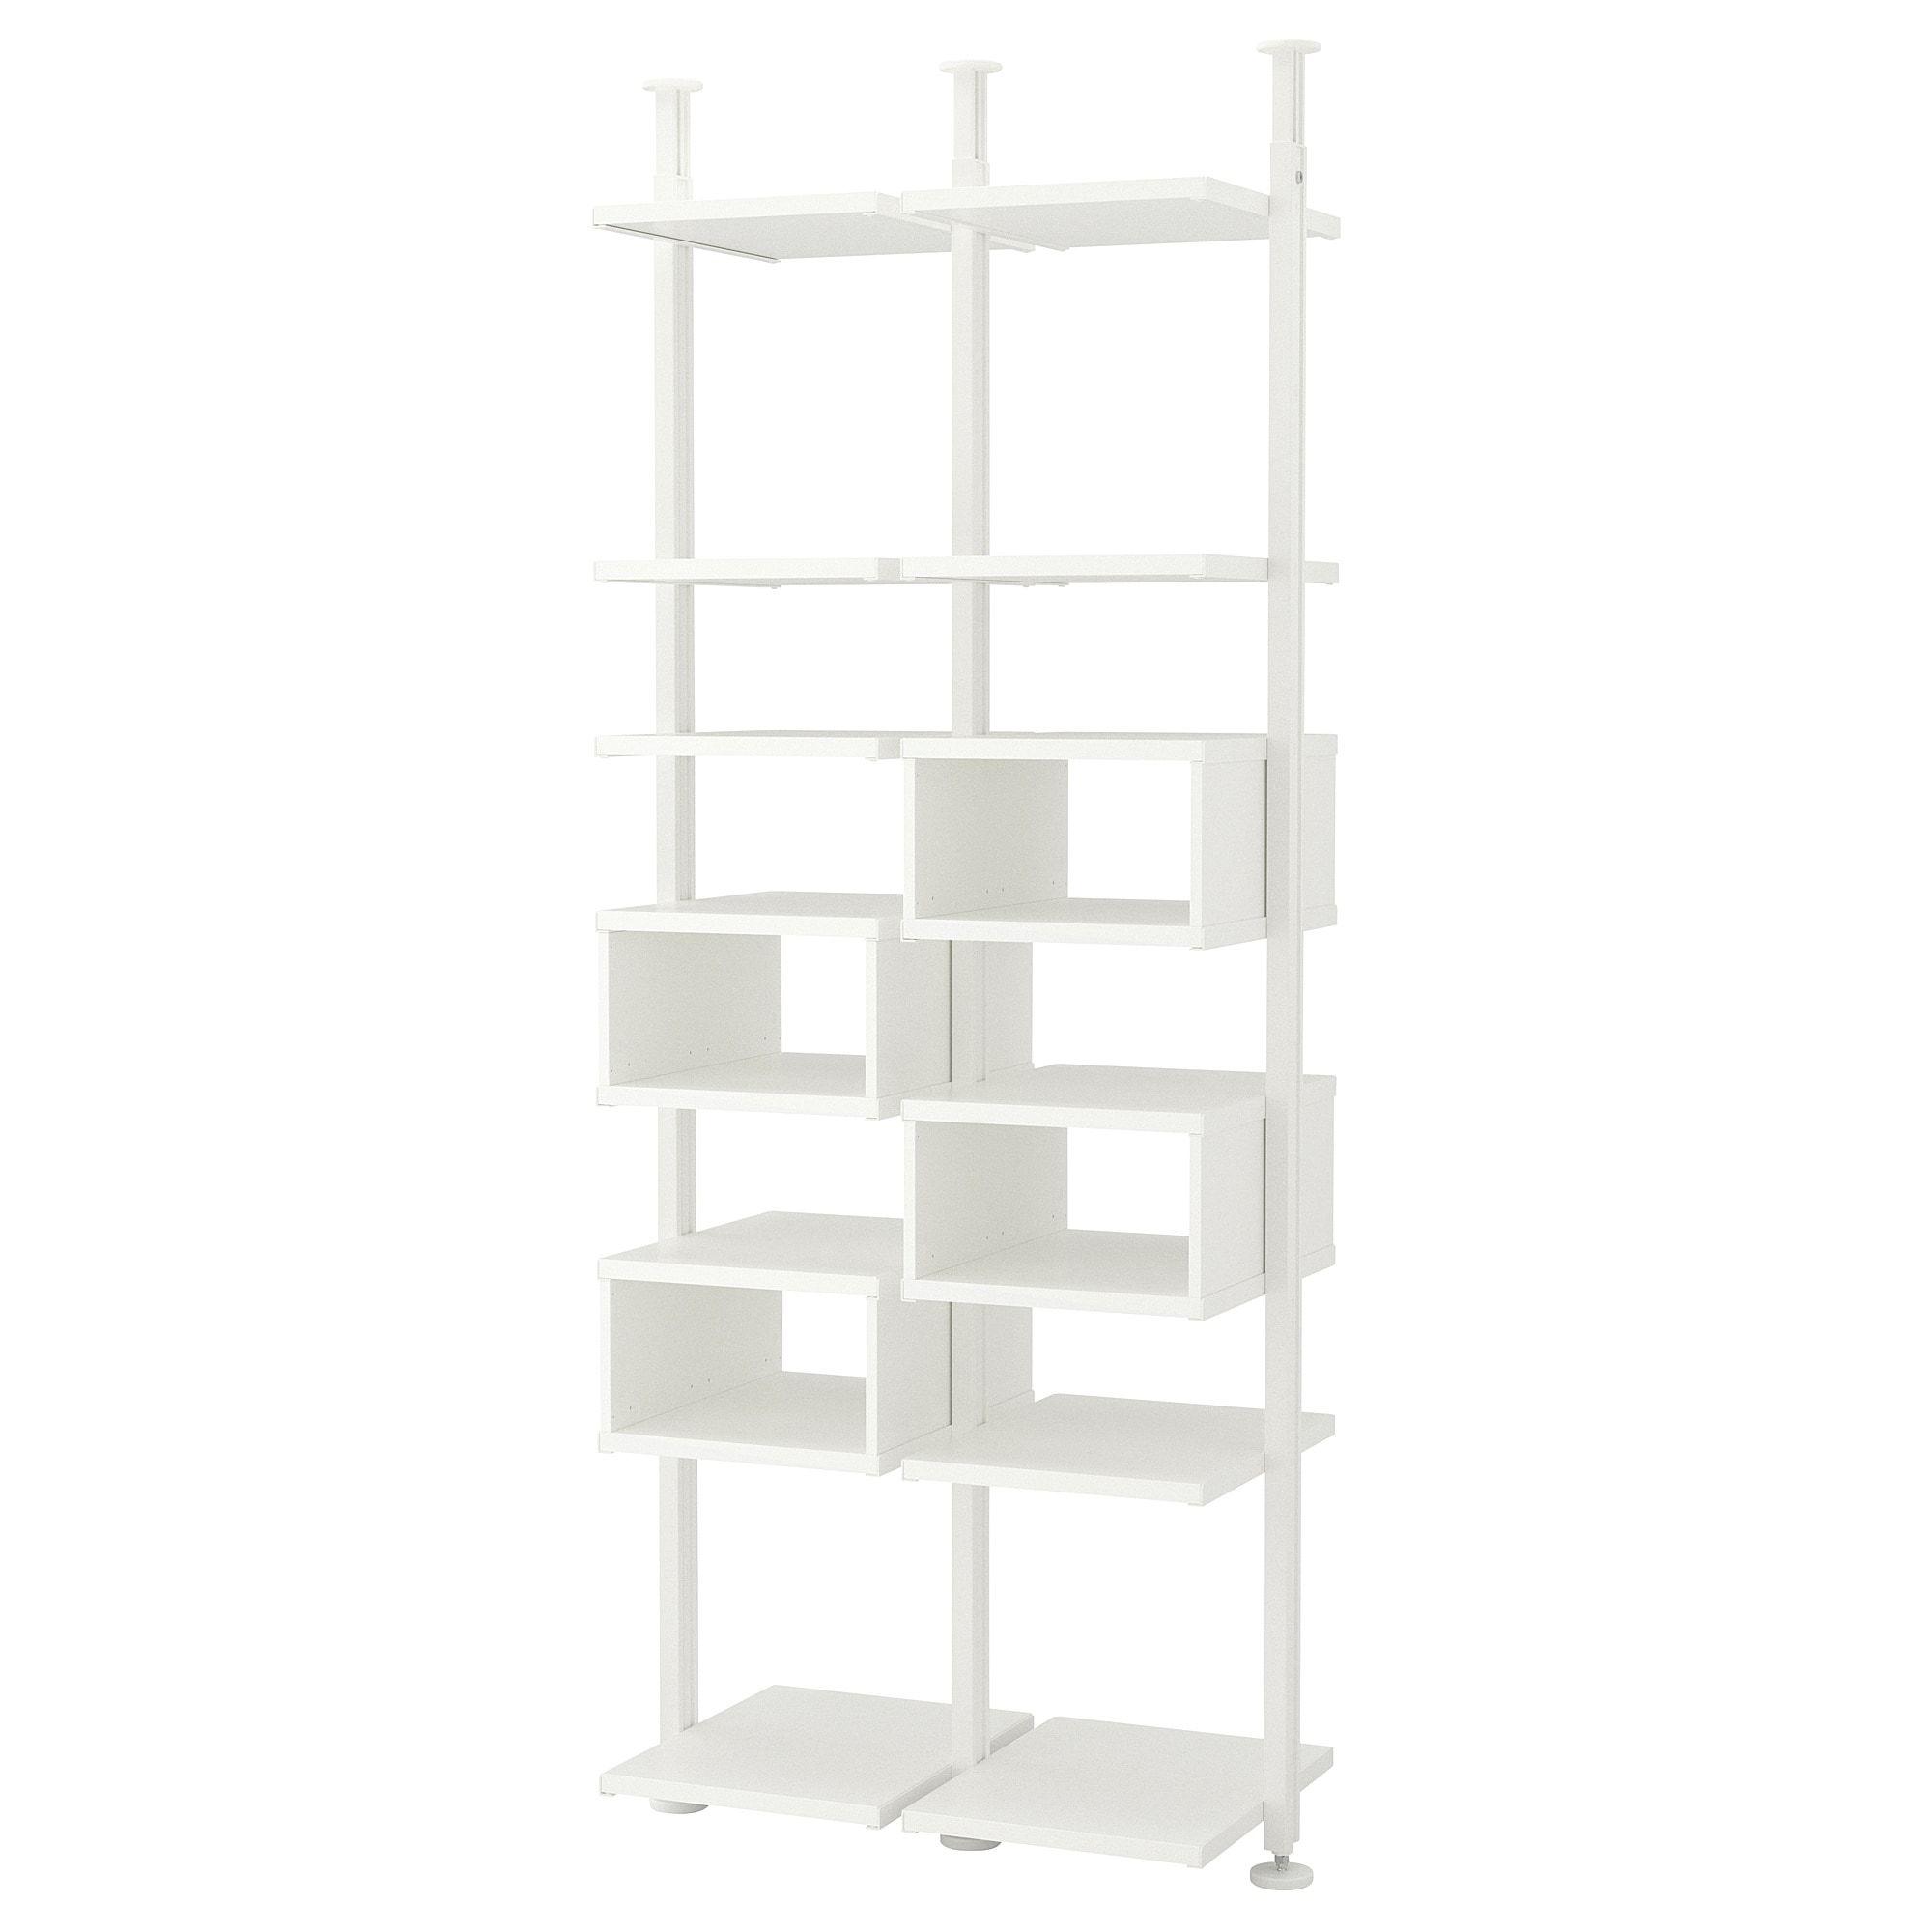 Ikea  Elvarli 2 Section Shelving Unit White